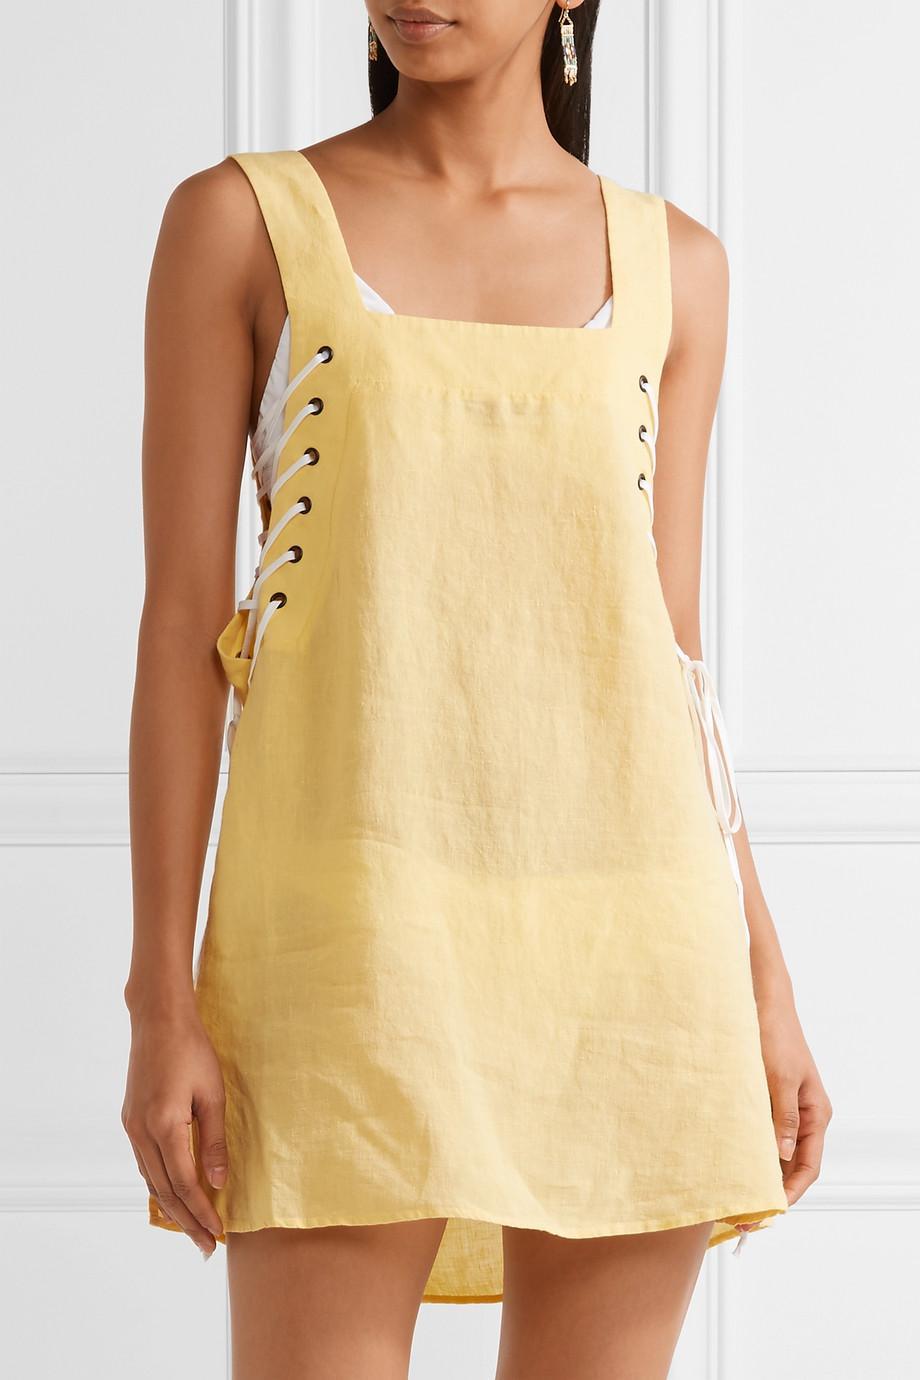 Waikiki Lace-up Linen Mini Dress - Yellow Marysia Swim Top Quality Online nft97